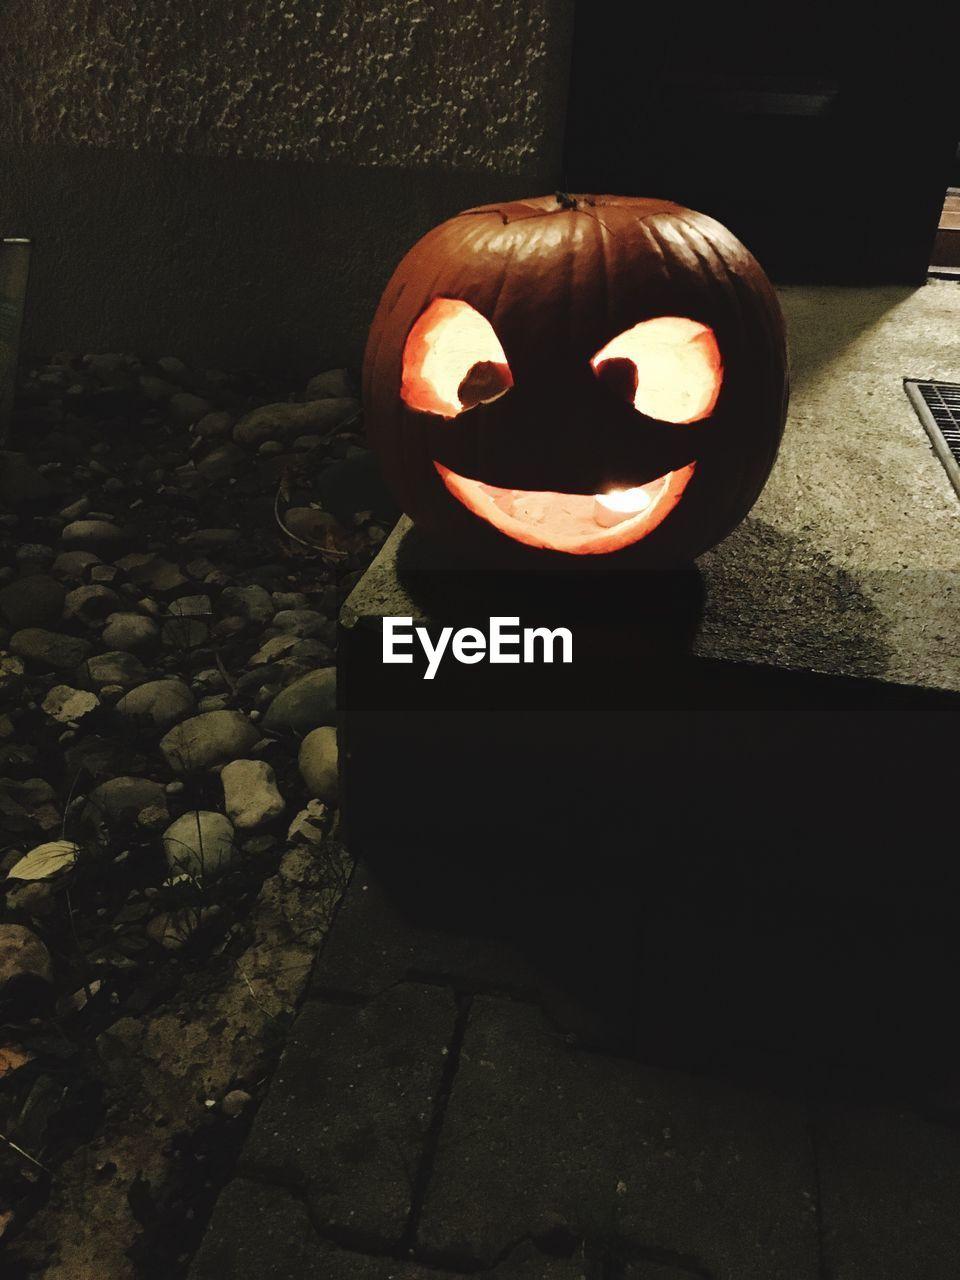 pumpkin, halloween, creativity, anthropomorphic face, art and craft, jack o lantern, no people, celebration, night, spooky, shadow, outdoors, lantern, illuminated, close-up